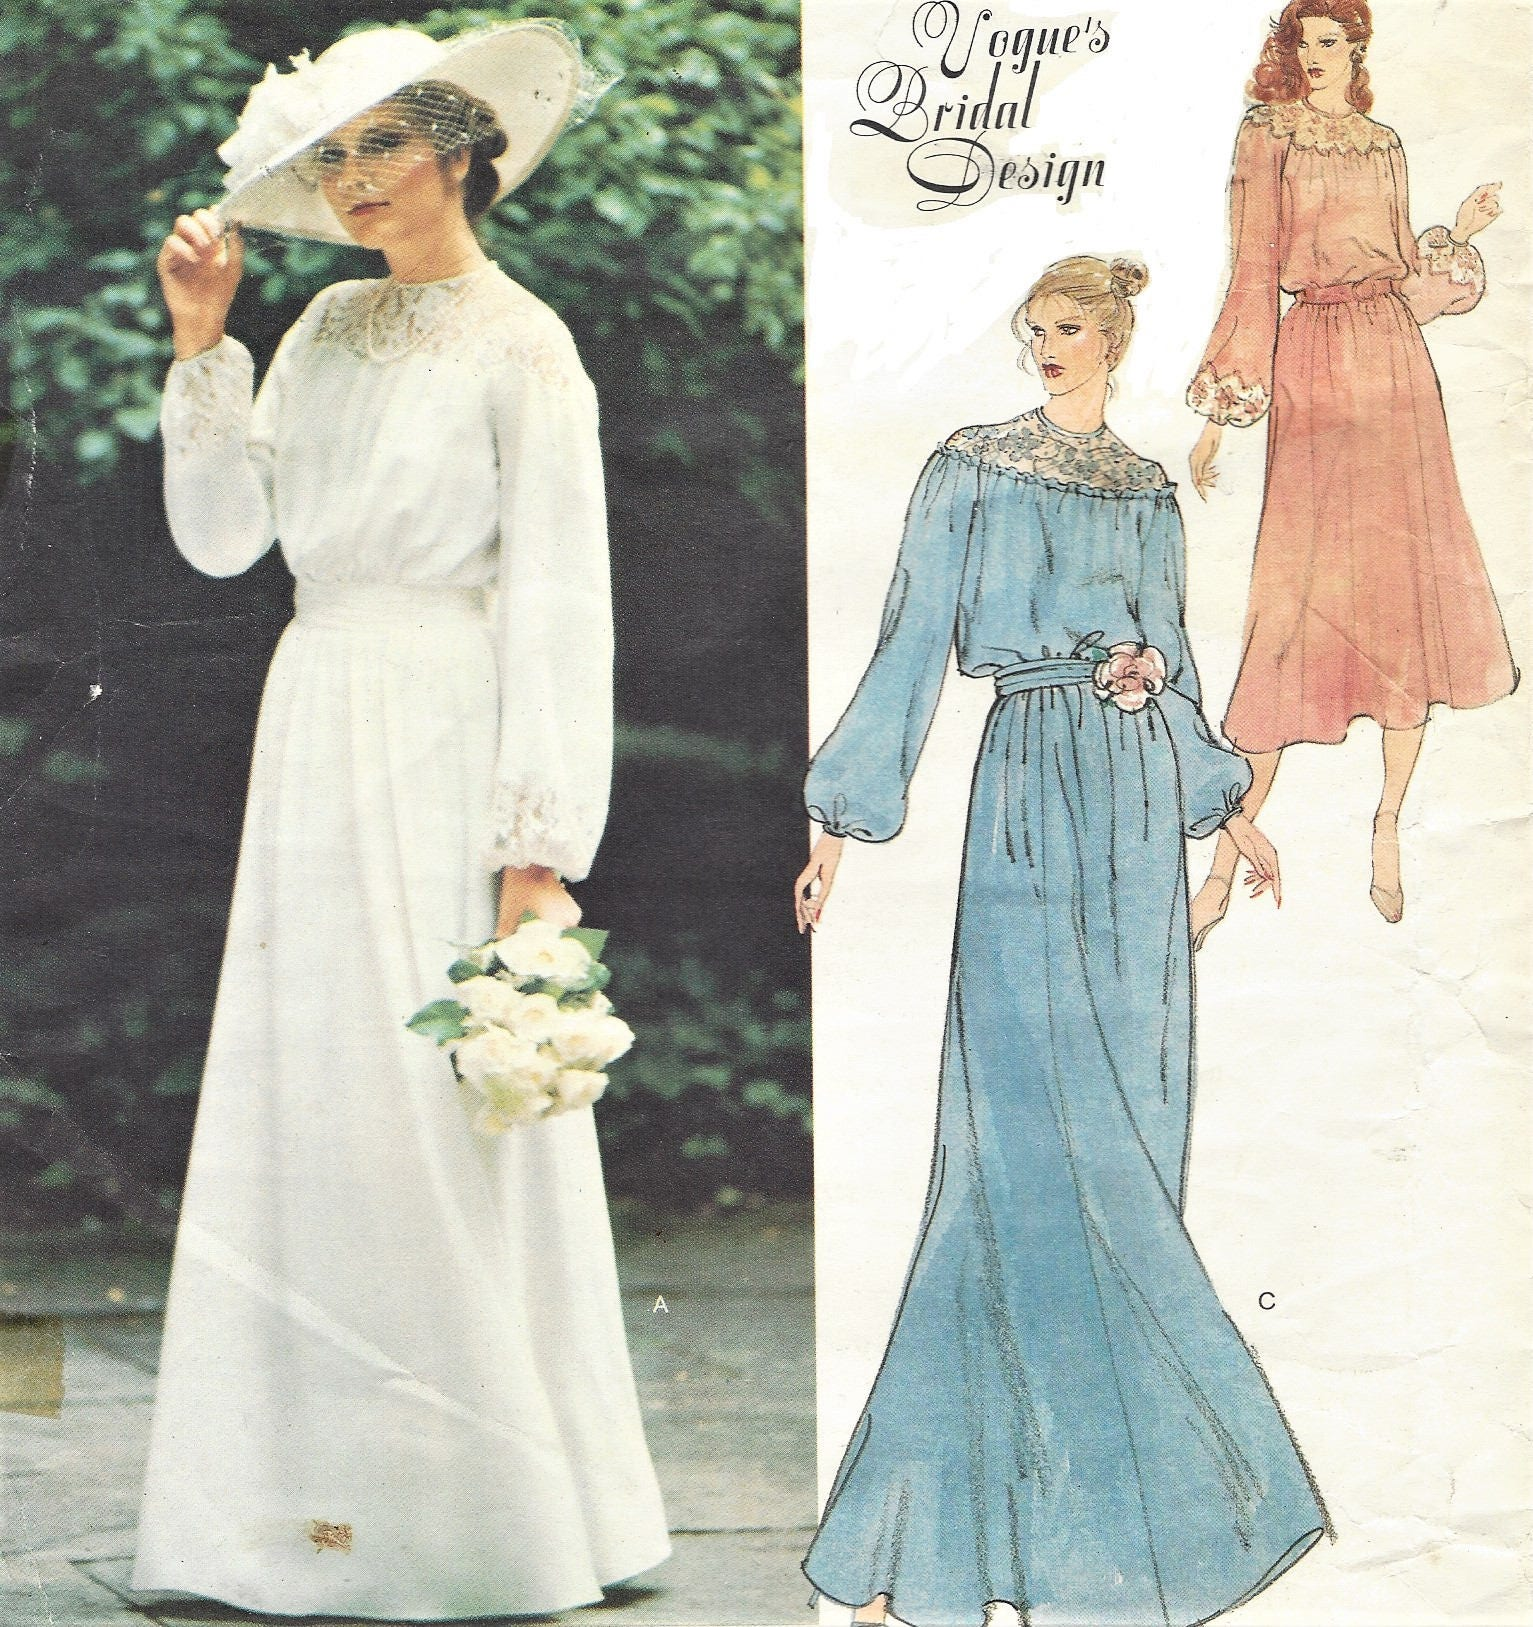 Attractive Carrie Bradshaw Wedding Dress Composition - All Wedding ...